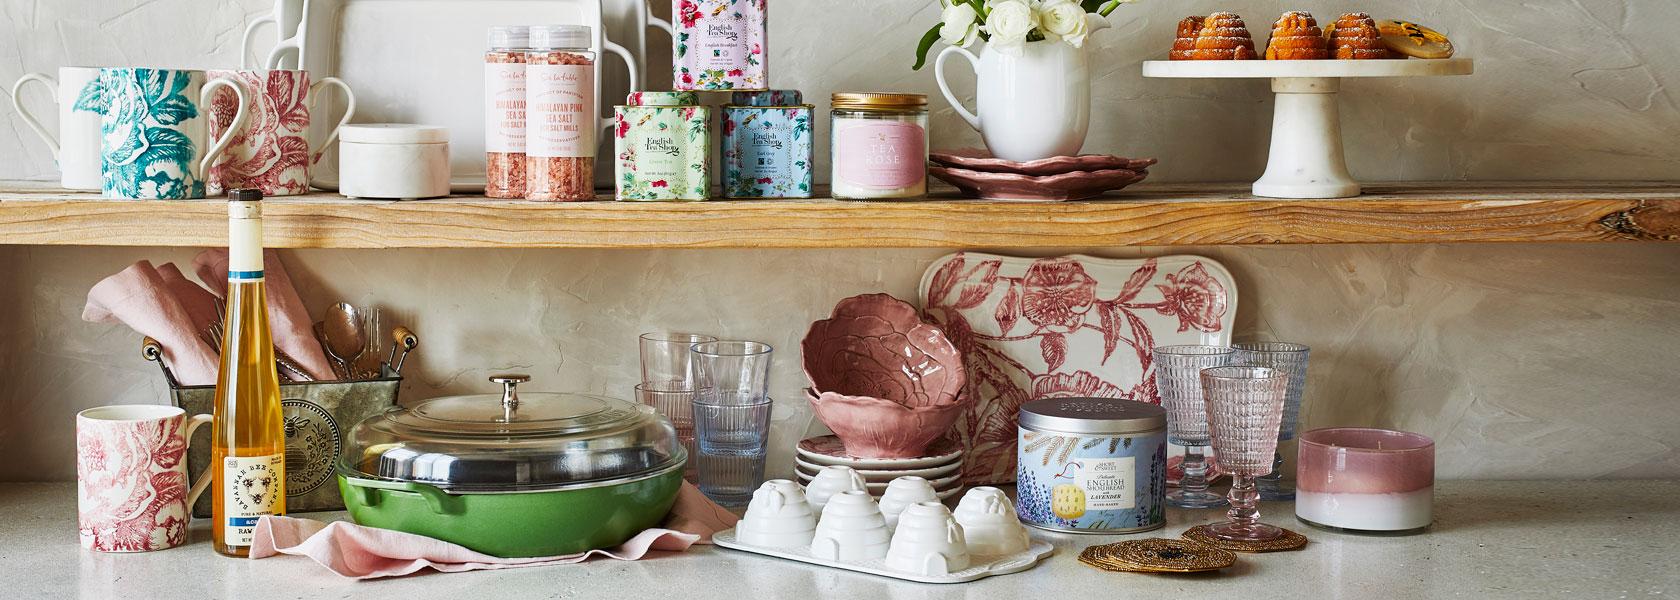 scented candles, tins of tea, Nordic Ware beehive pan, Staub Heritage pan